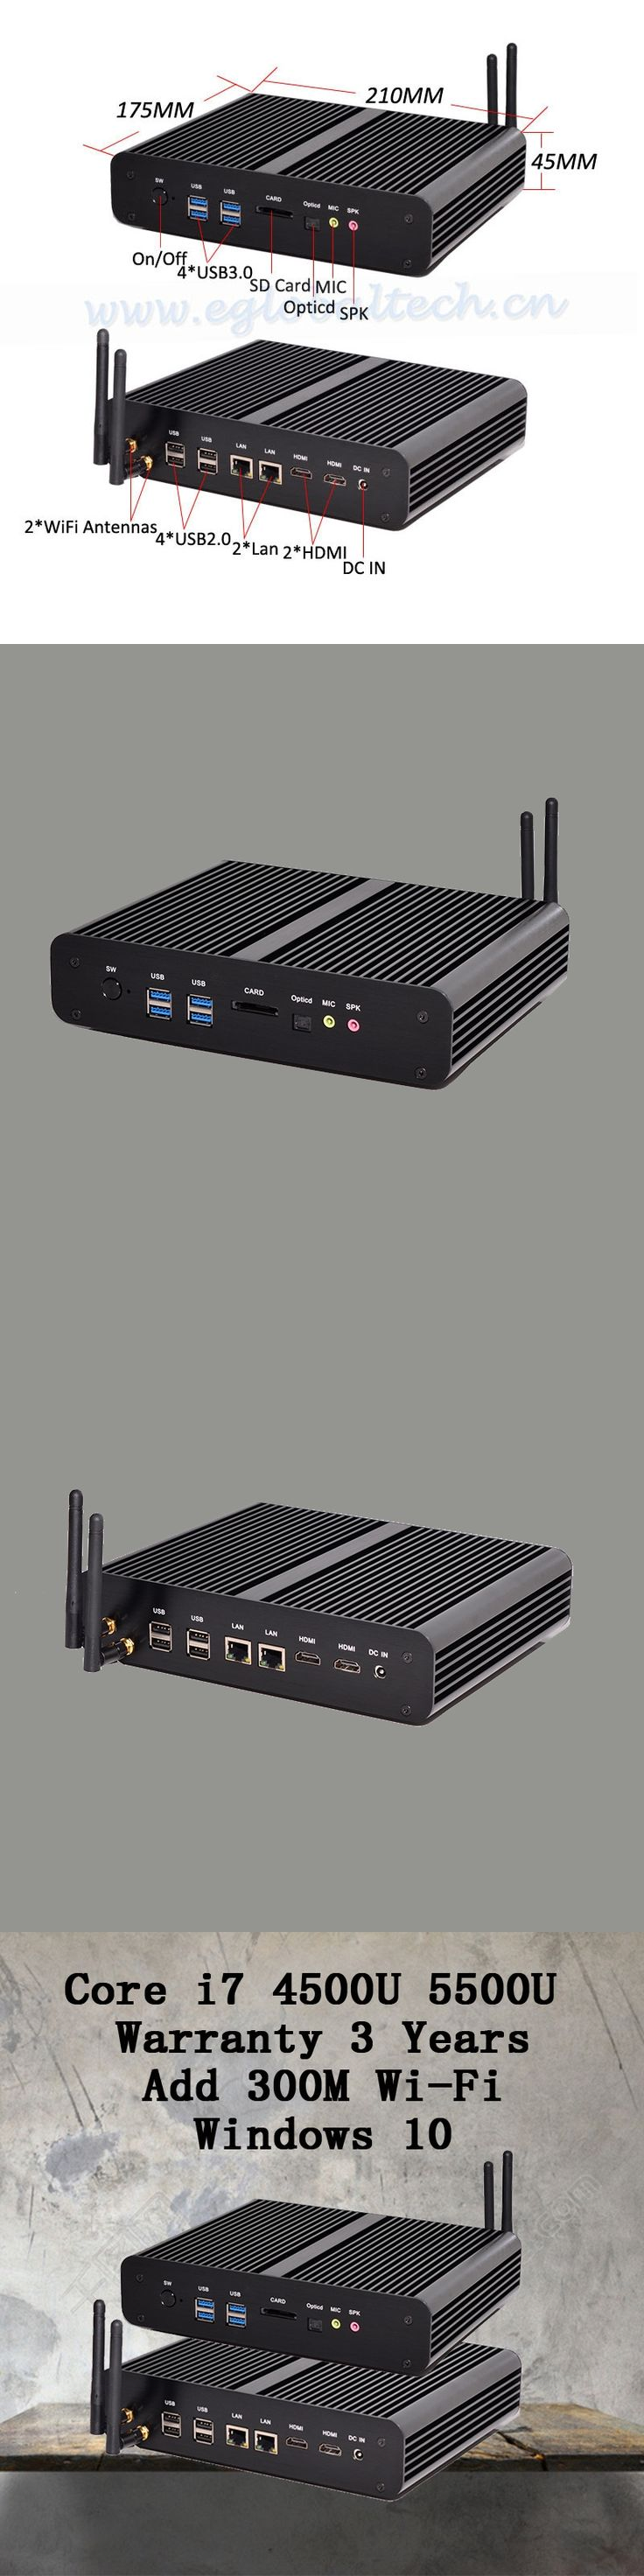 Mini PC Graphique HD 5500 Windows 2 HDMI Carte 4 K HTPC Mini-Itx Micro Intel Core i7 5500U mini computer 8G RAM best combination